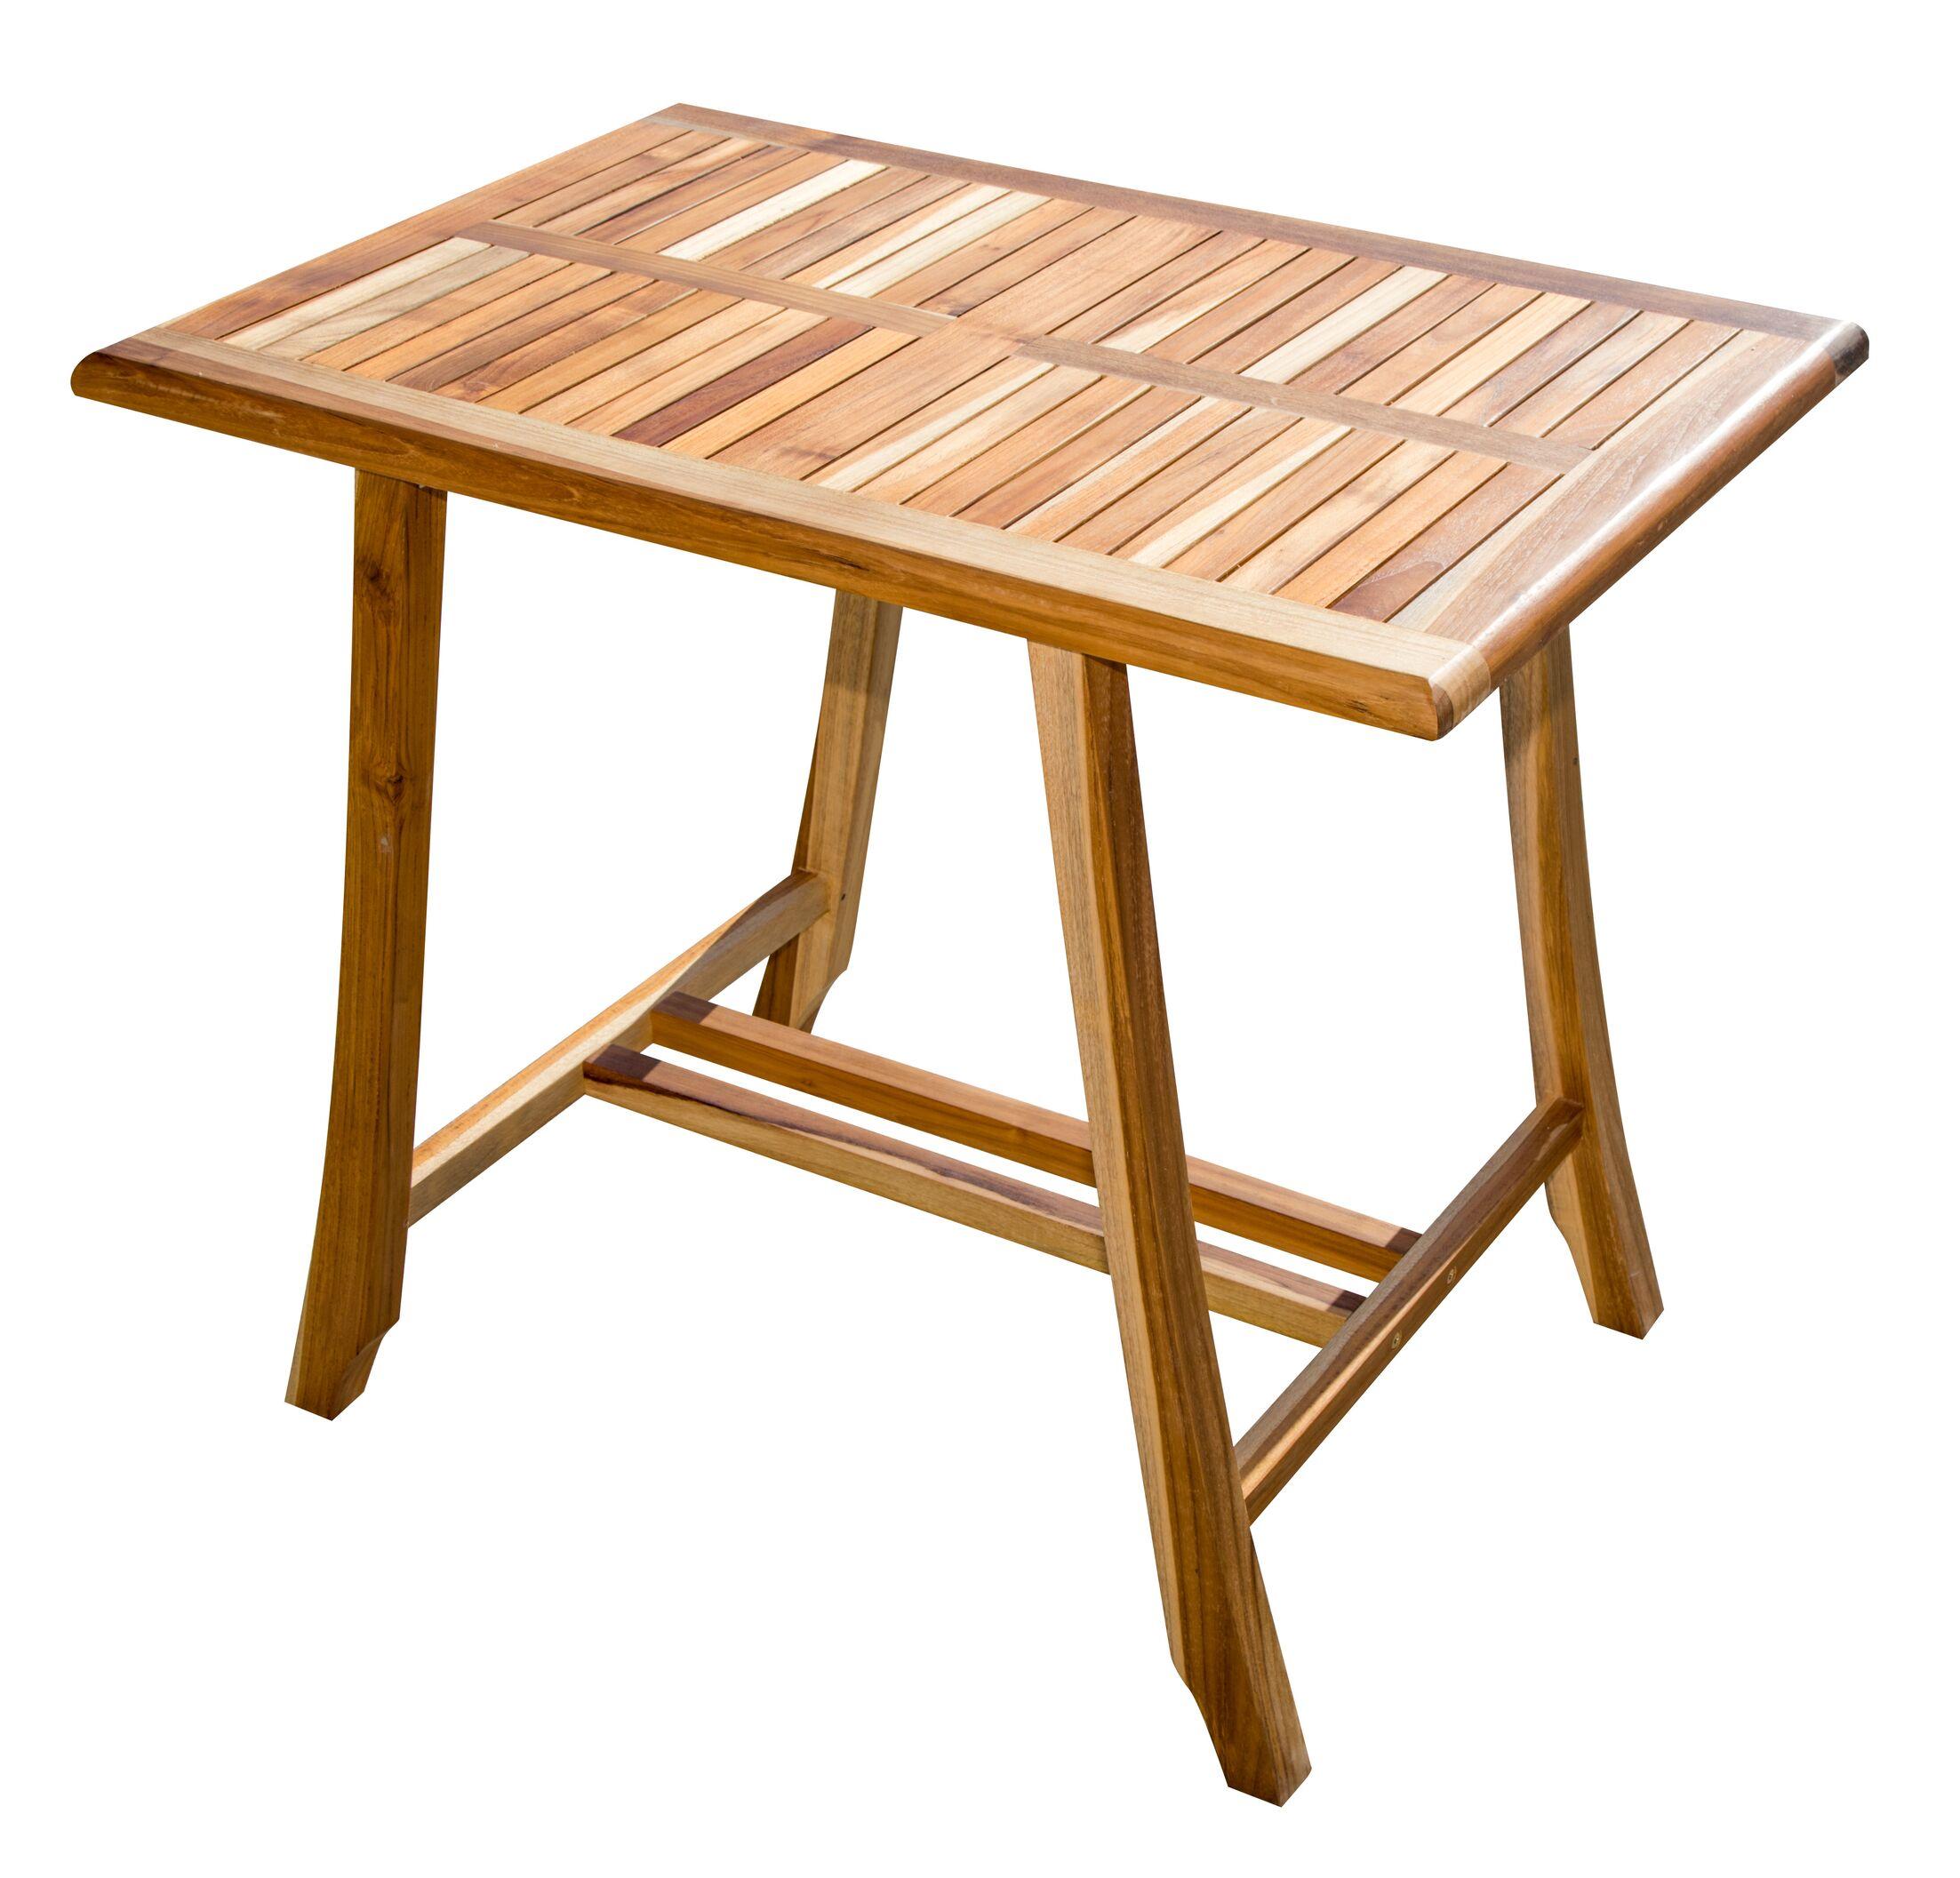 Satori Bistro Teak Dining Table Table Height: 40